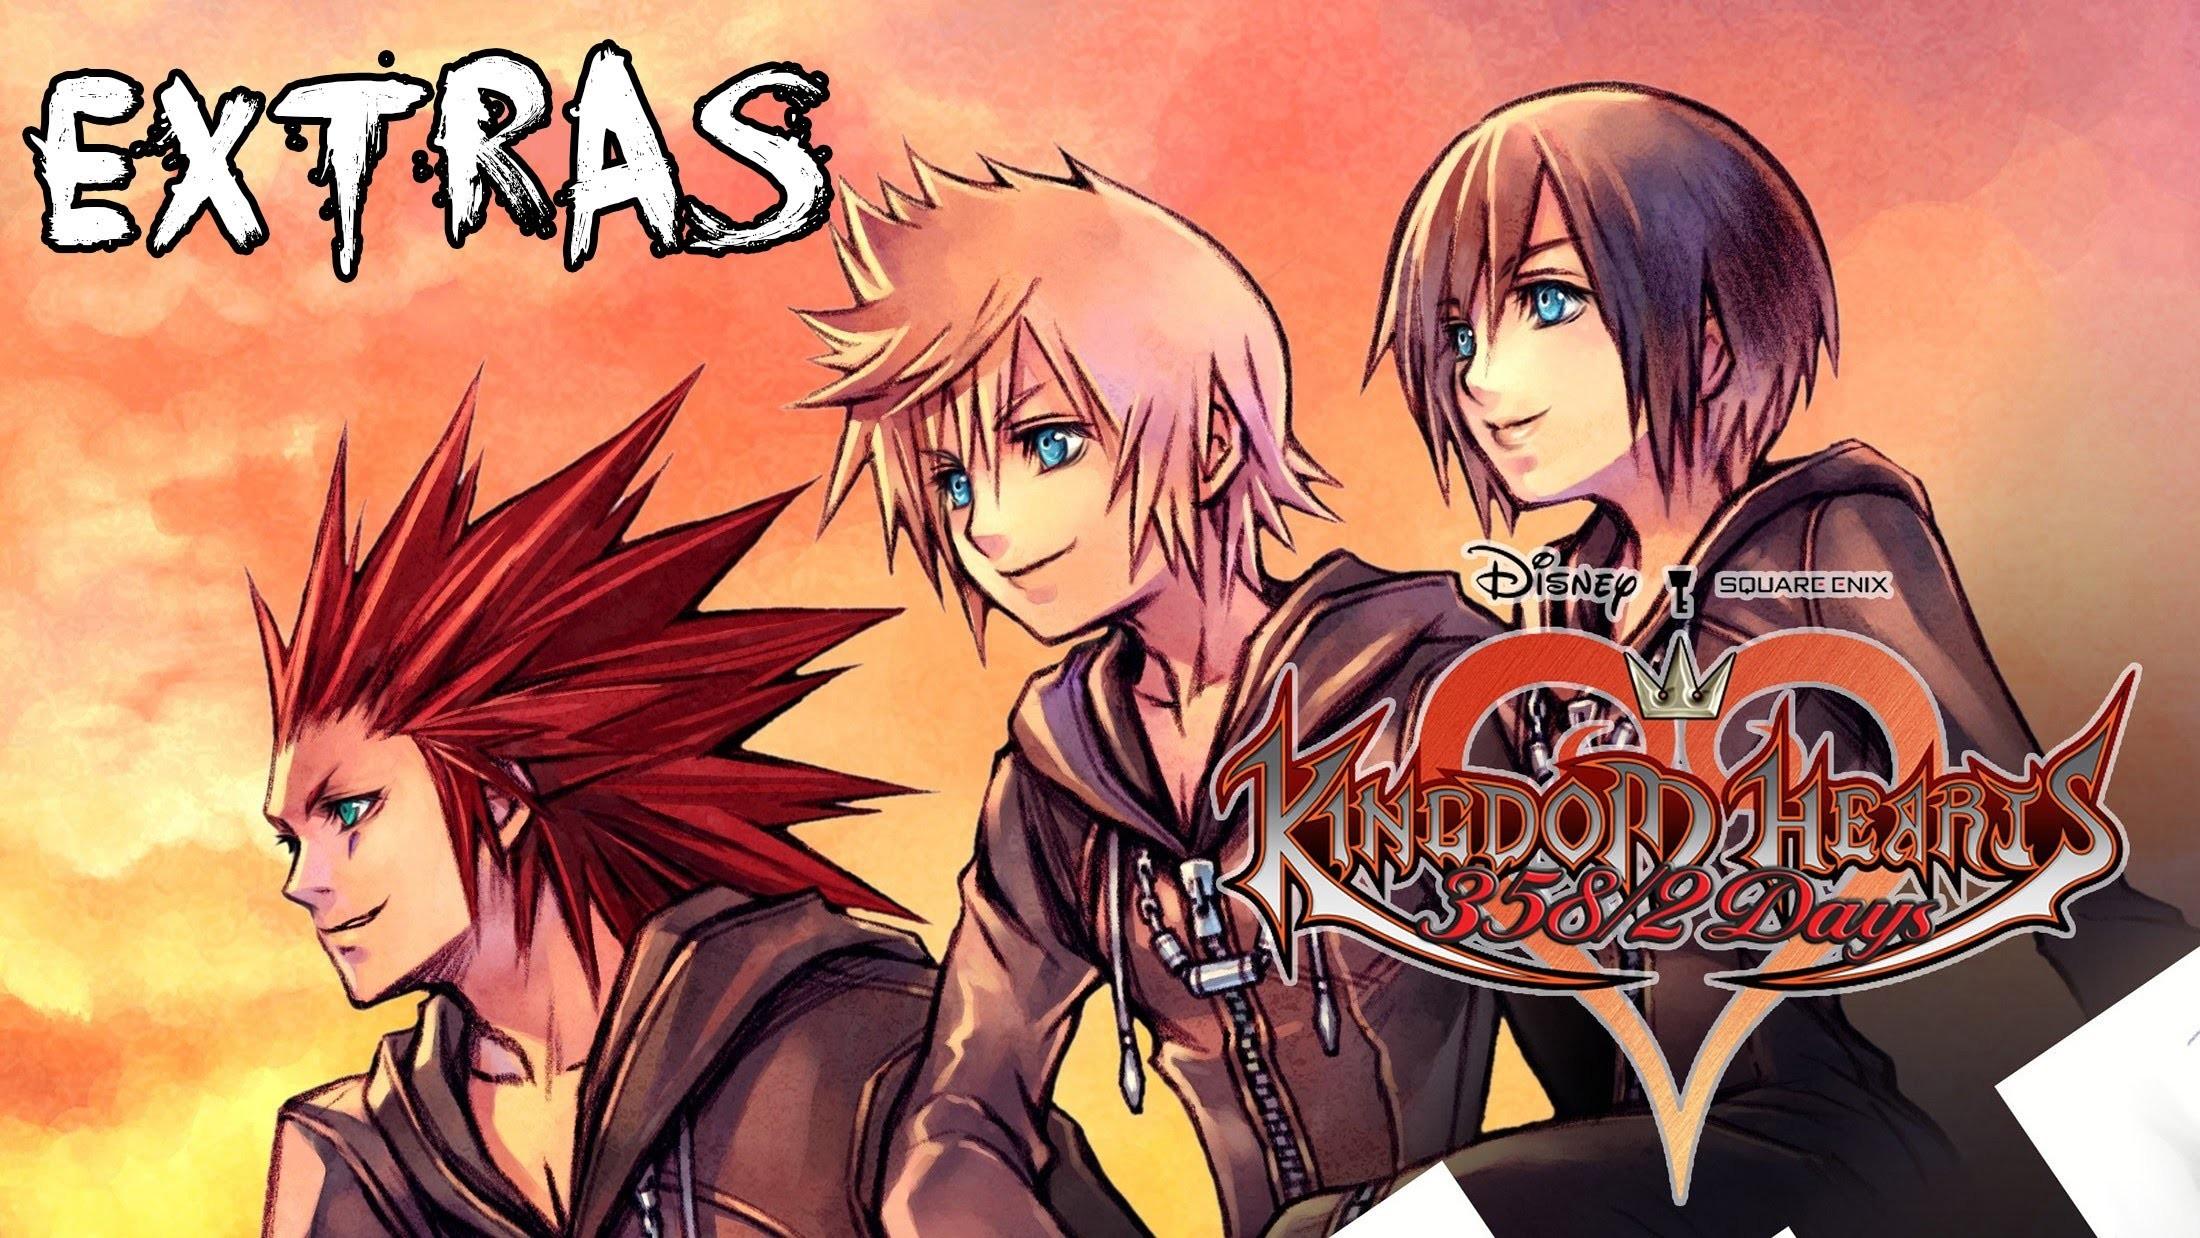 Kingdom Hearts 1.5 HD ReMiX ~ 358/2 days extras -Diario de Roxas completo-  [Espa̱ol] РYouTube